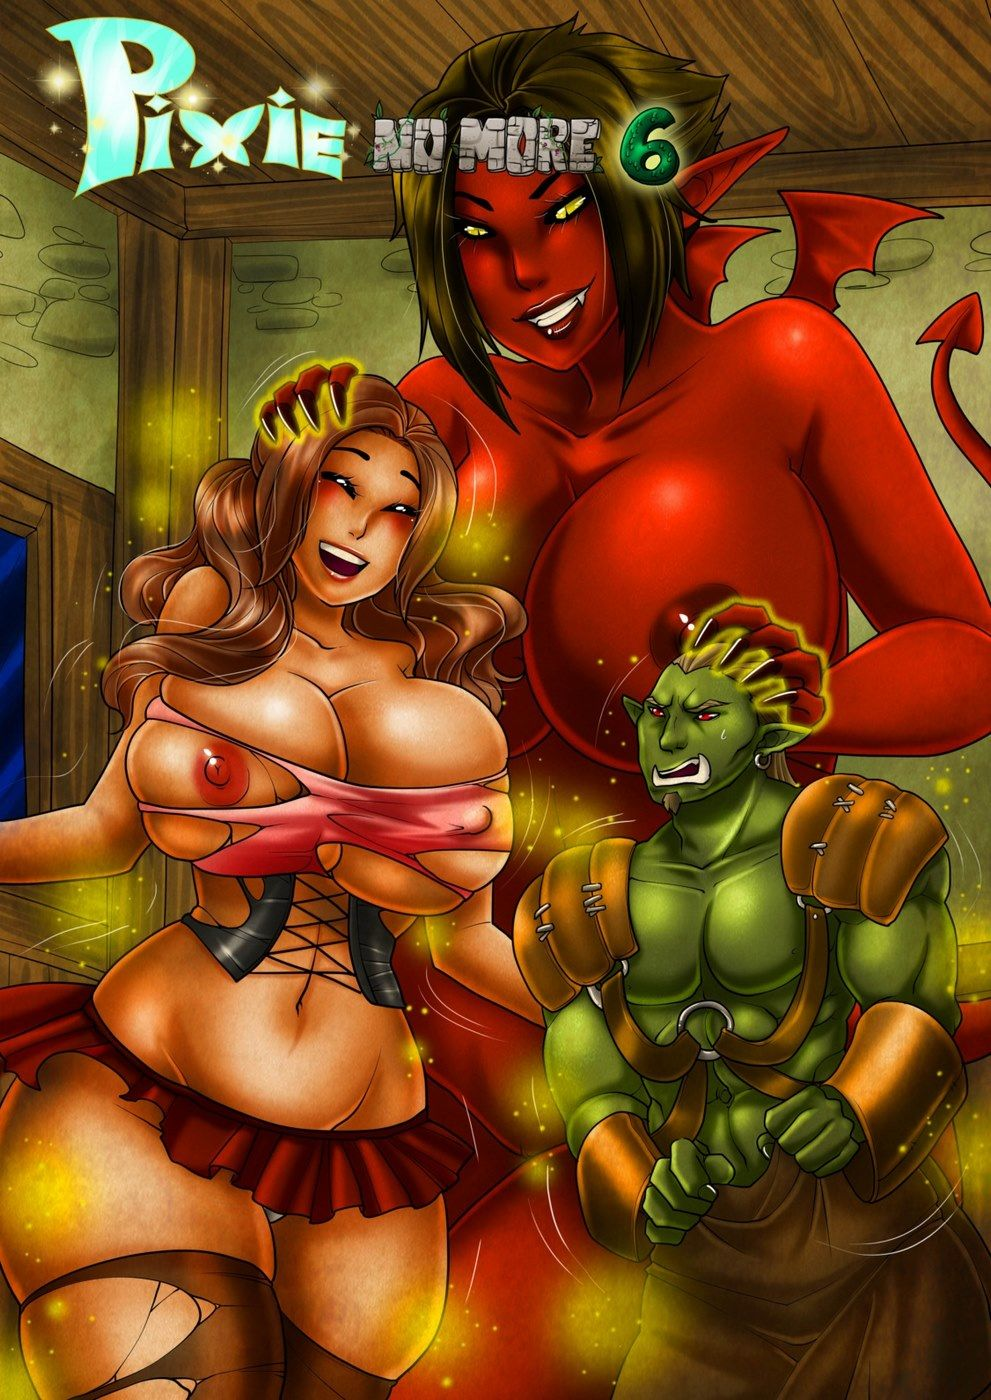 Pixie porn cartoons porn photos